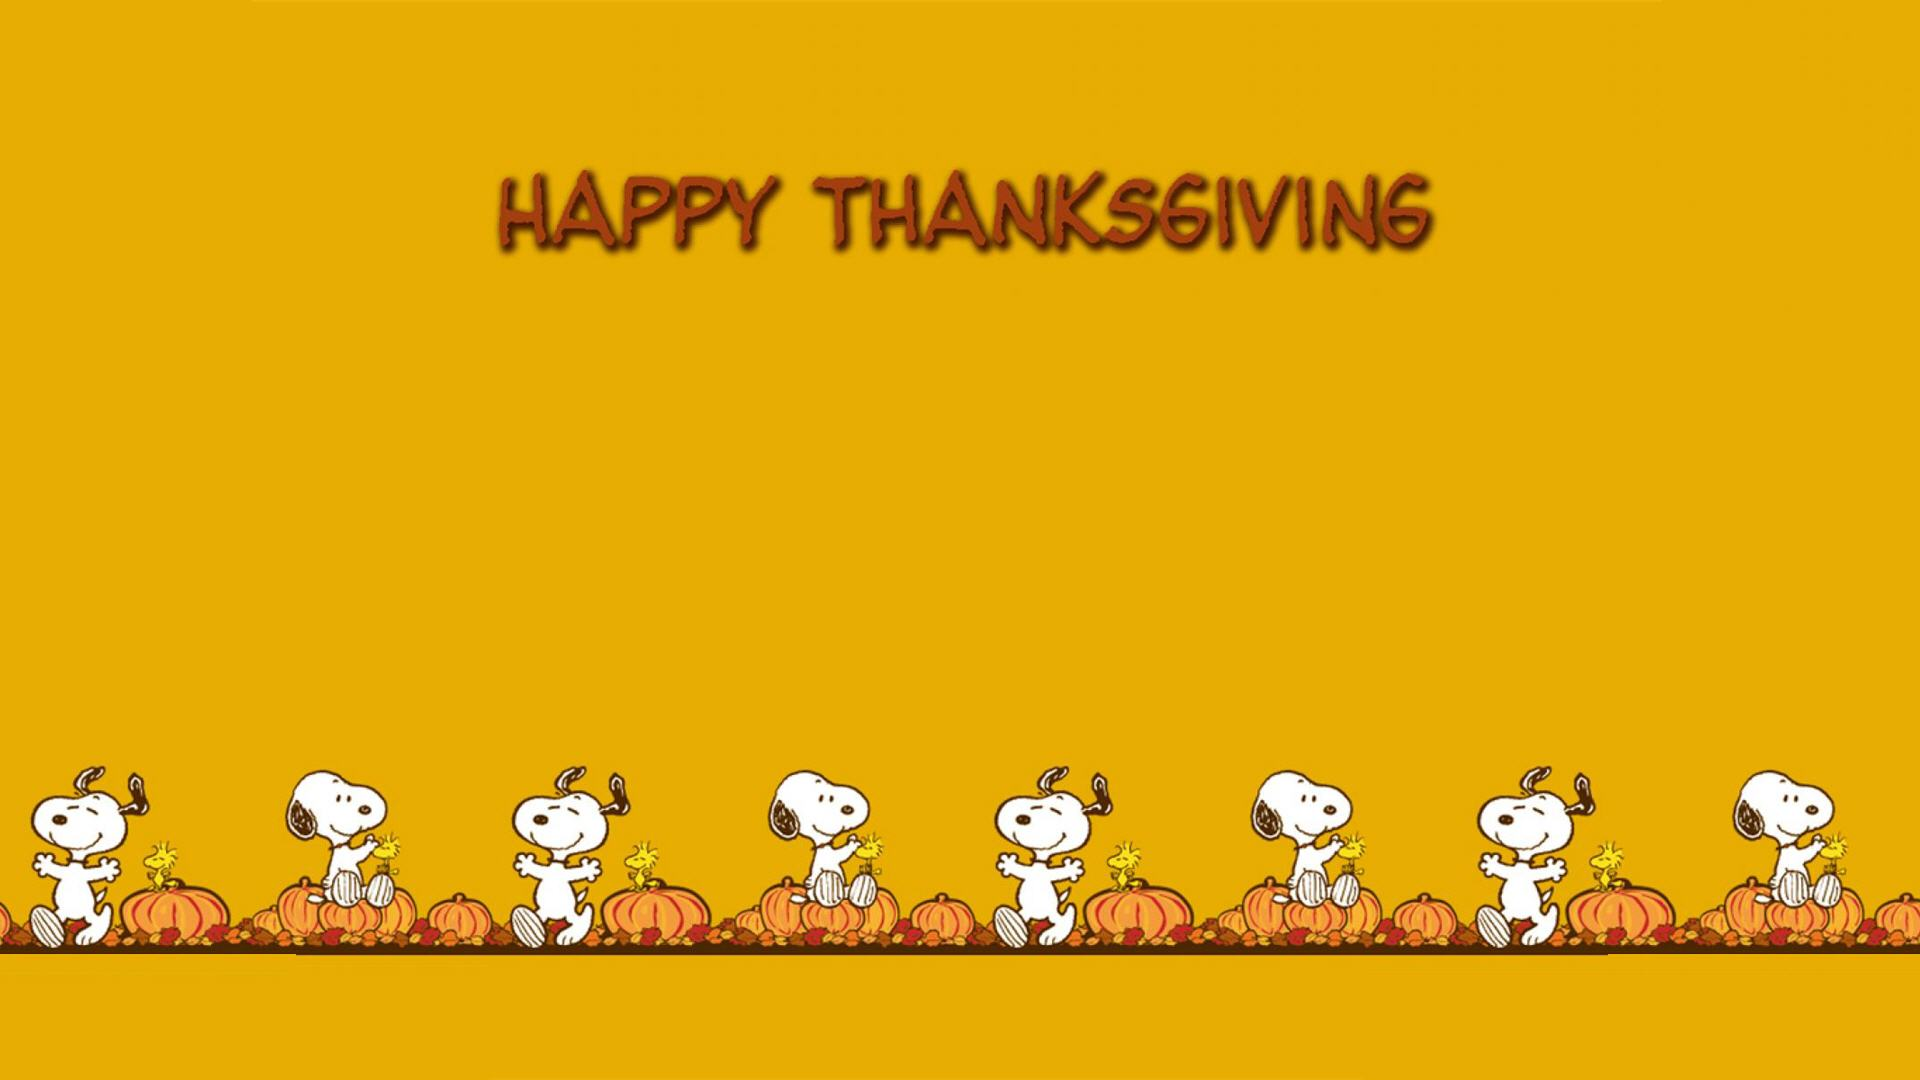 free desktop wallpaper 1920x1080 thanksgiving